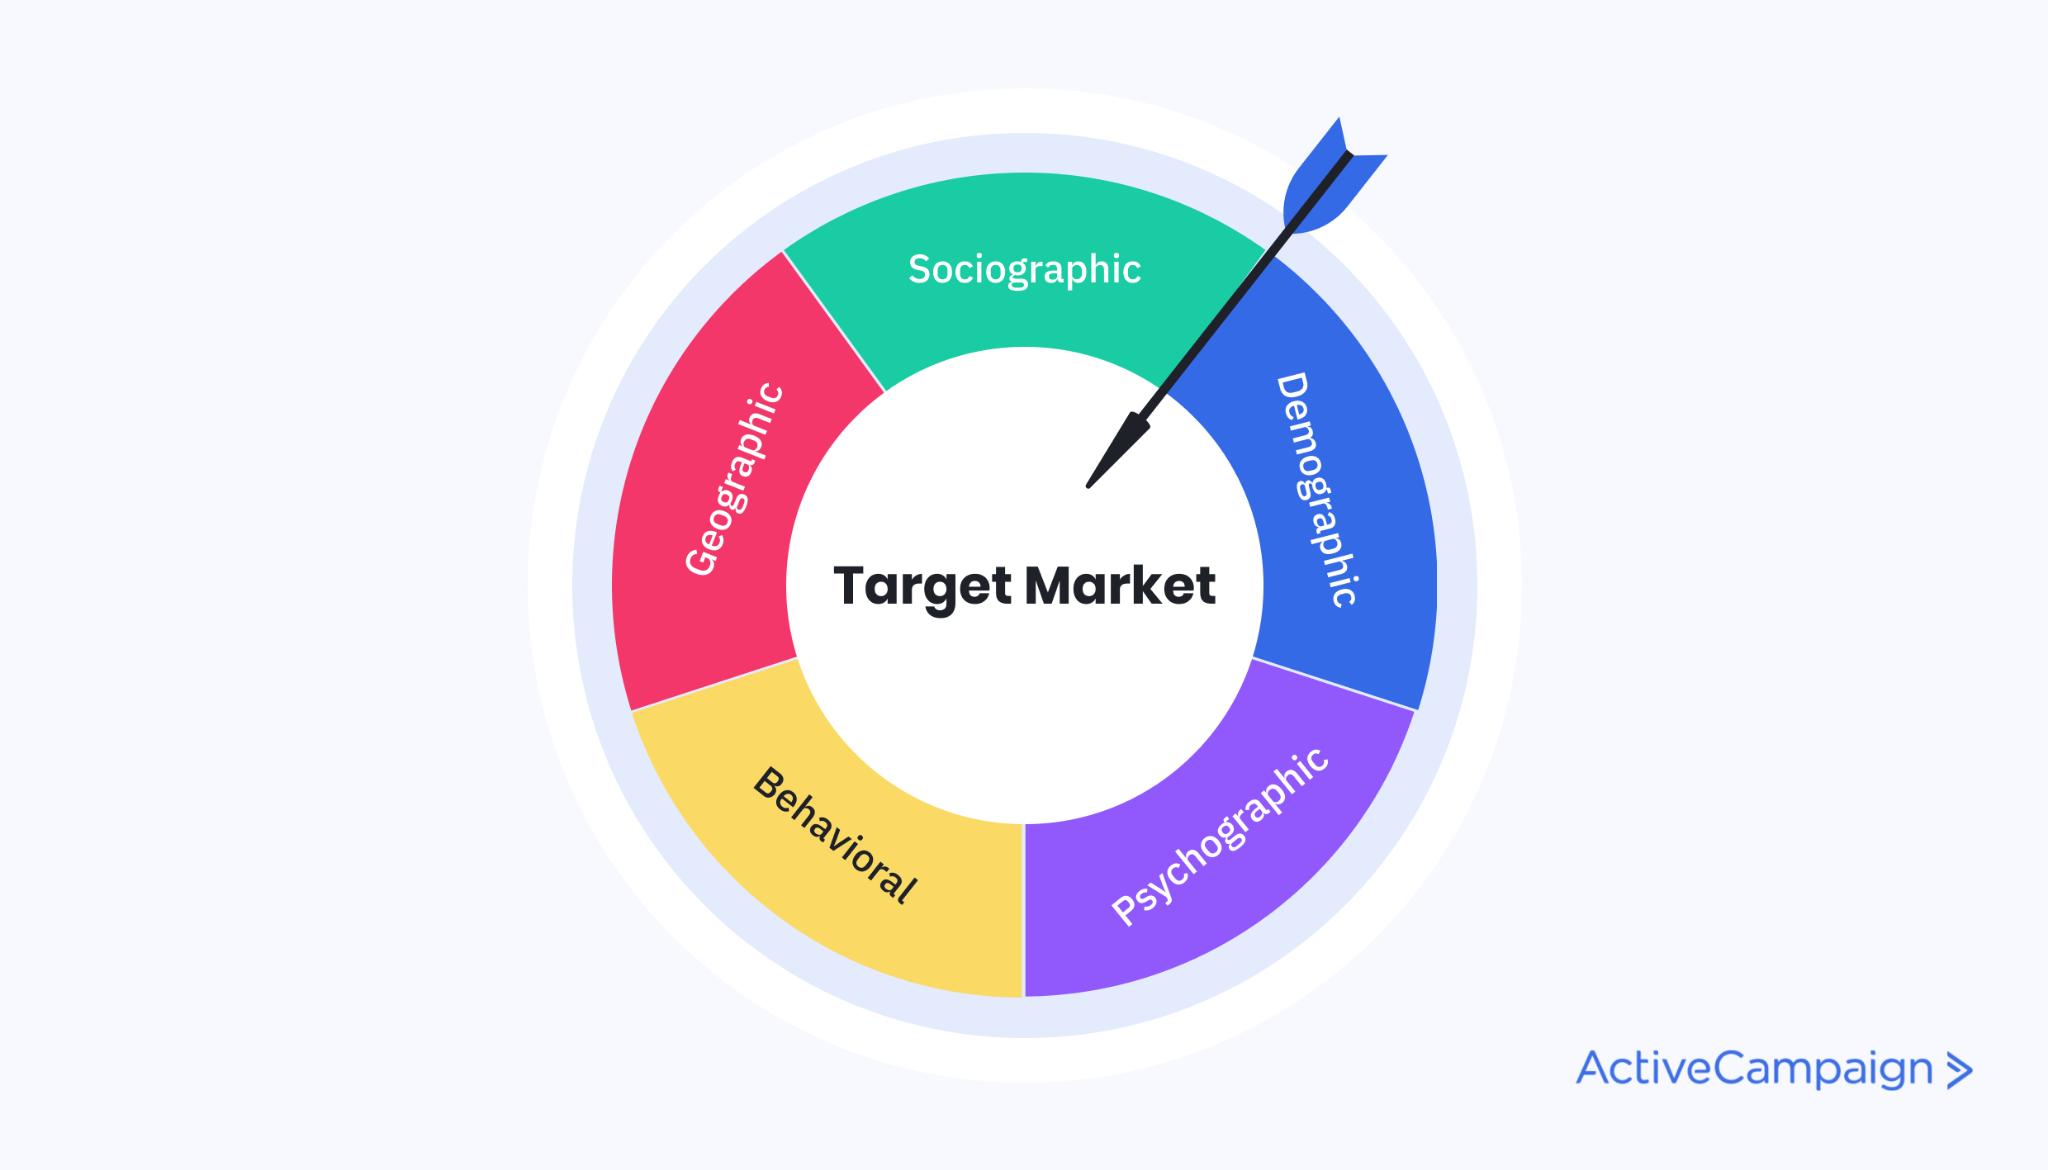 Image of the target market segmentations